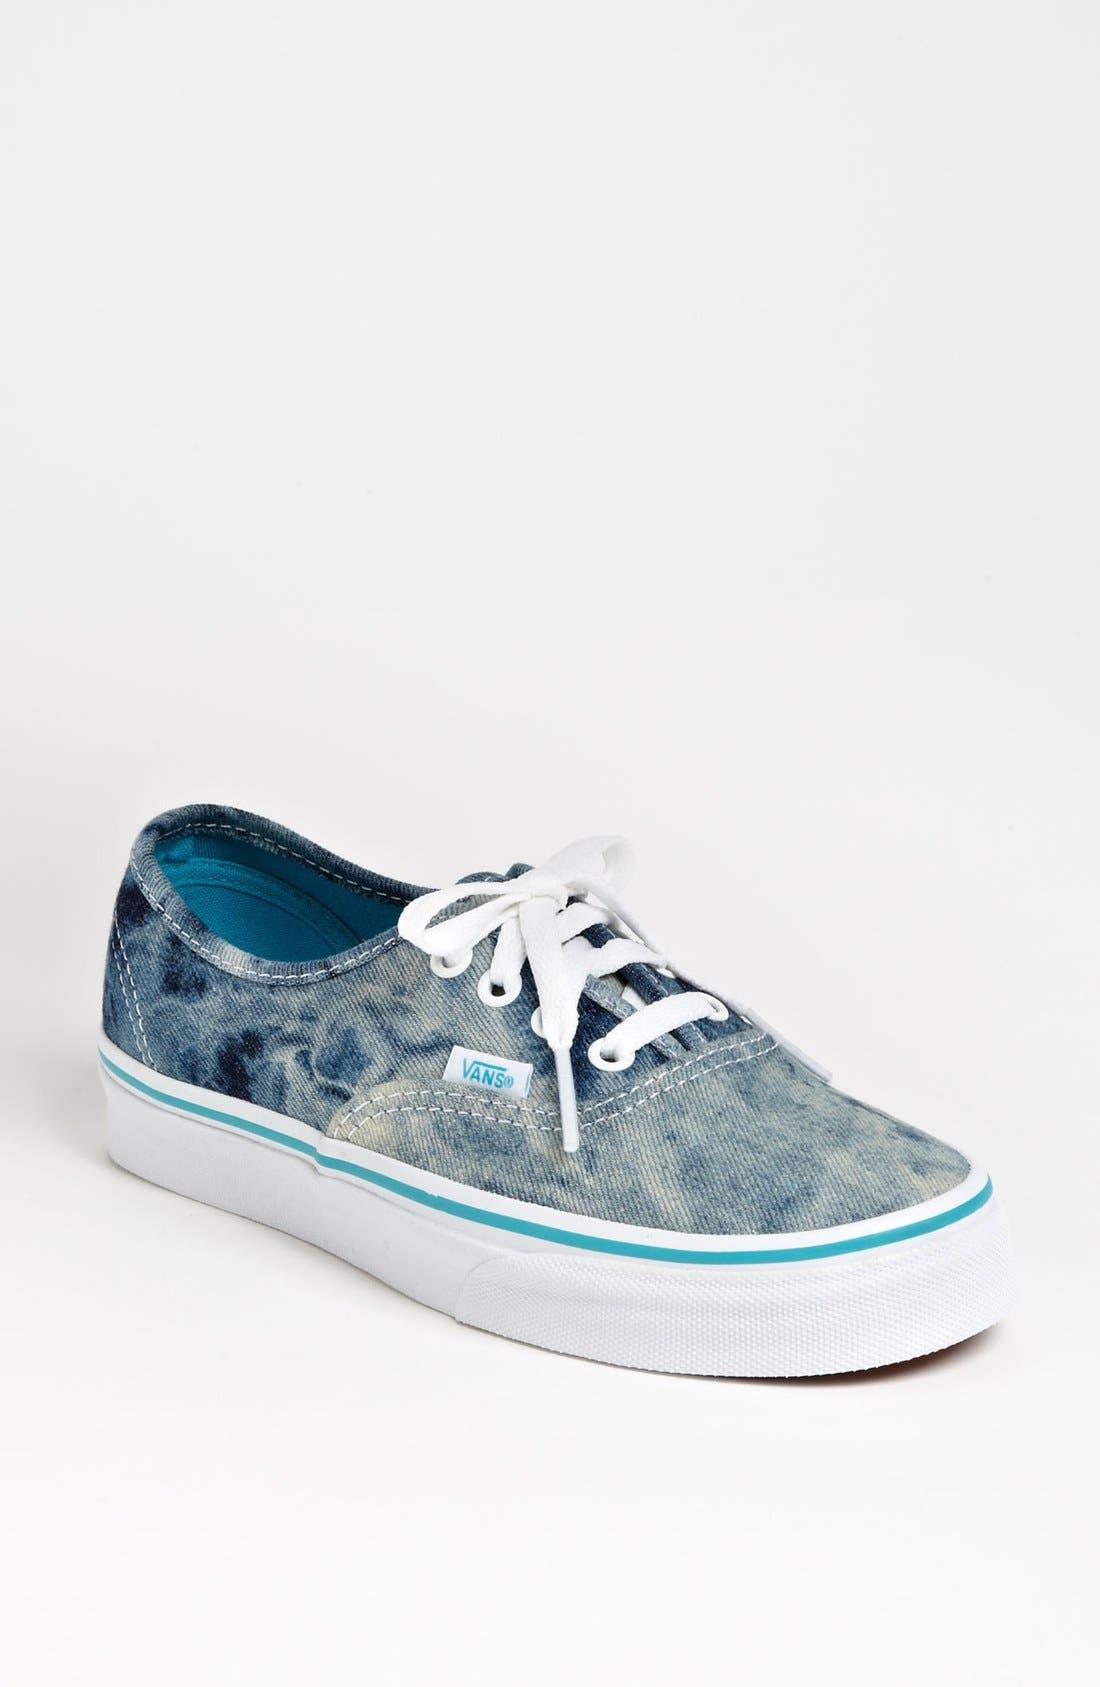 Main Image - Vans 'Authentic' Acid Wash Denim Sneaker